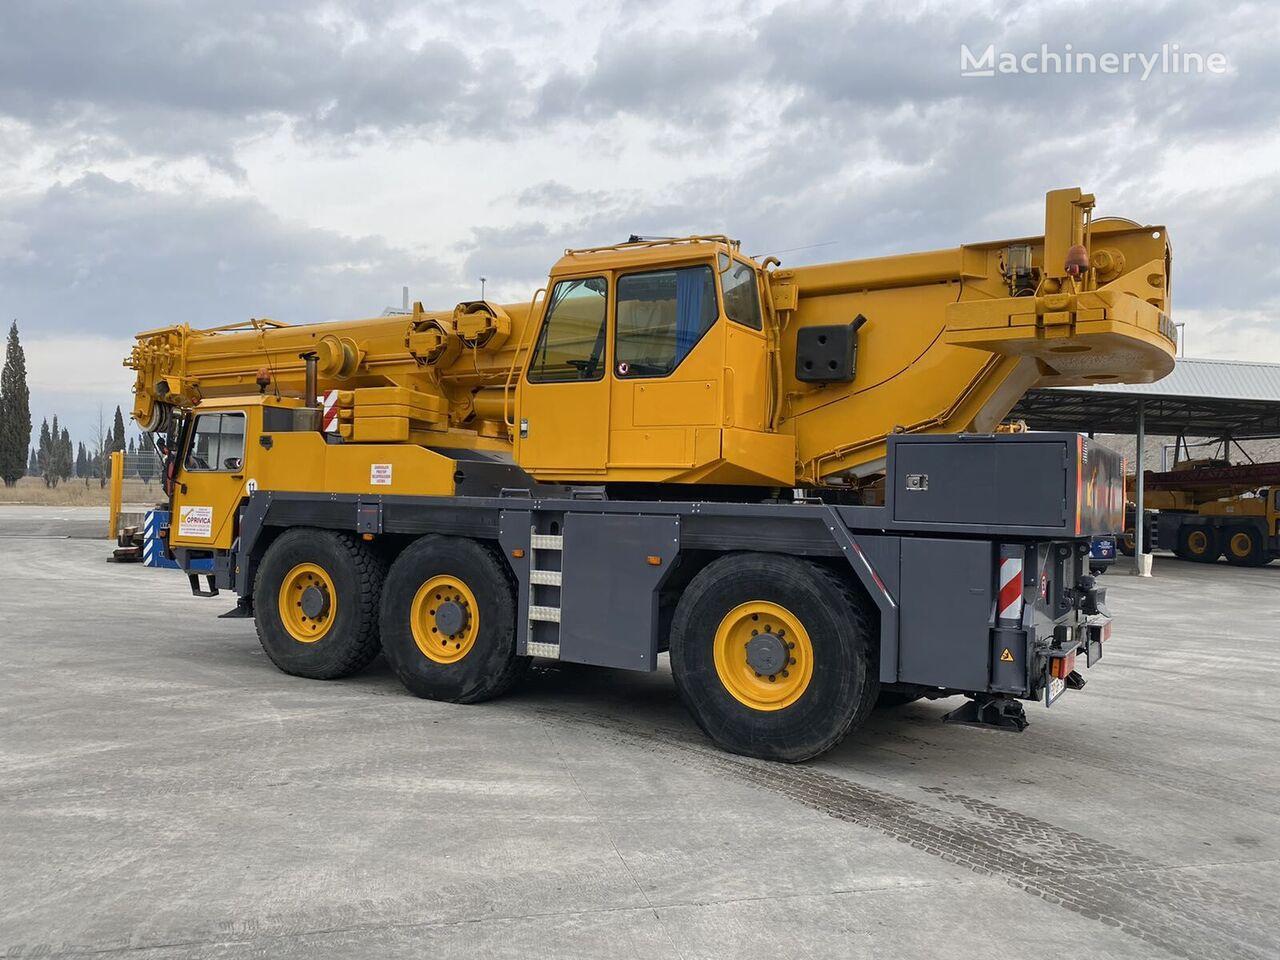 LIEBHERR LTM 1050/1 mobile crane